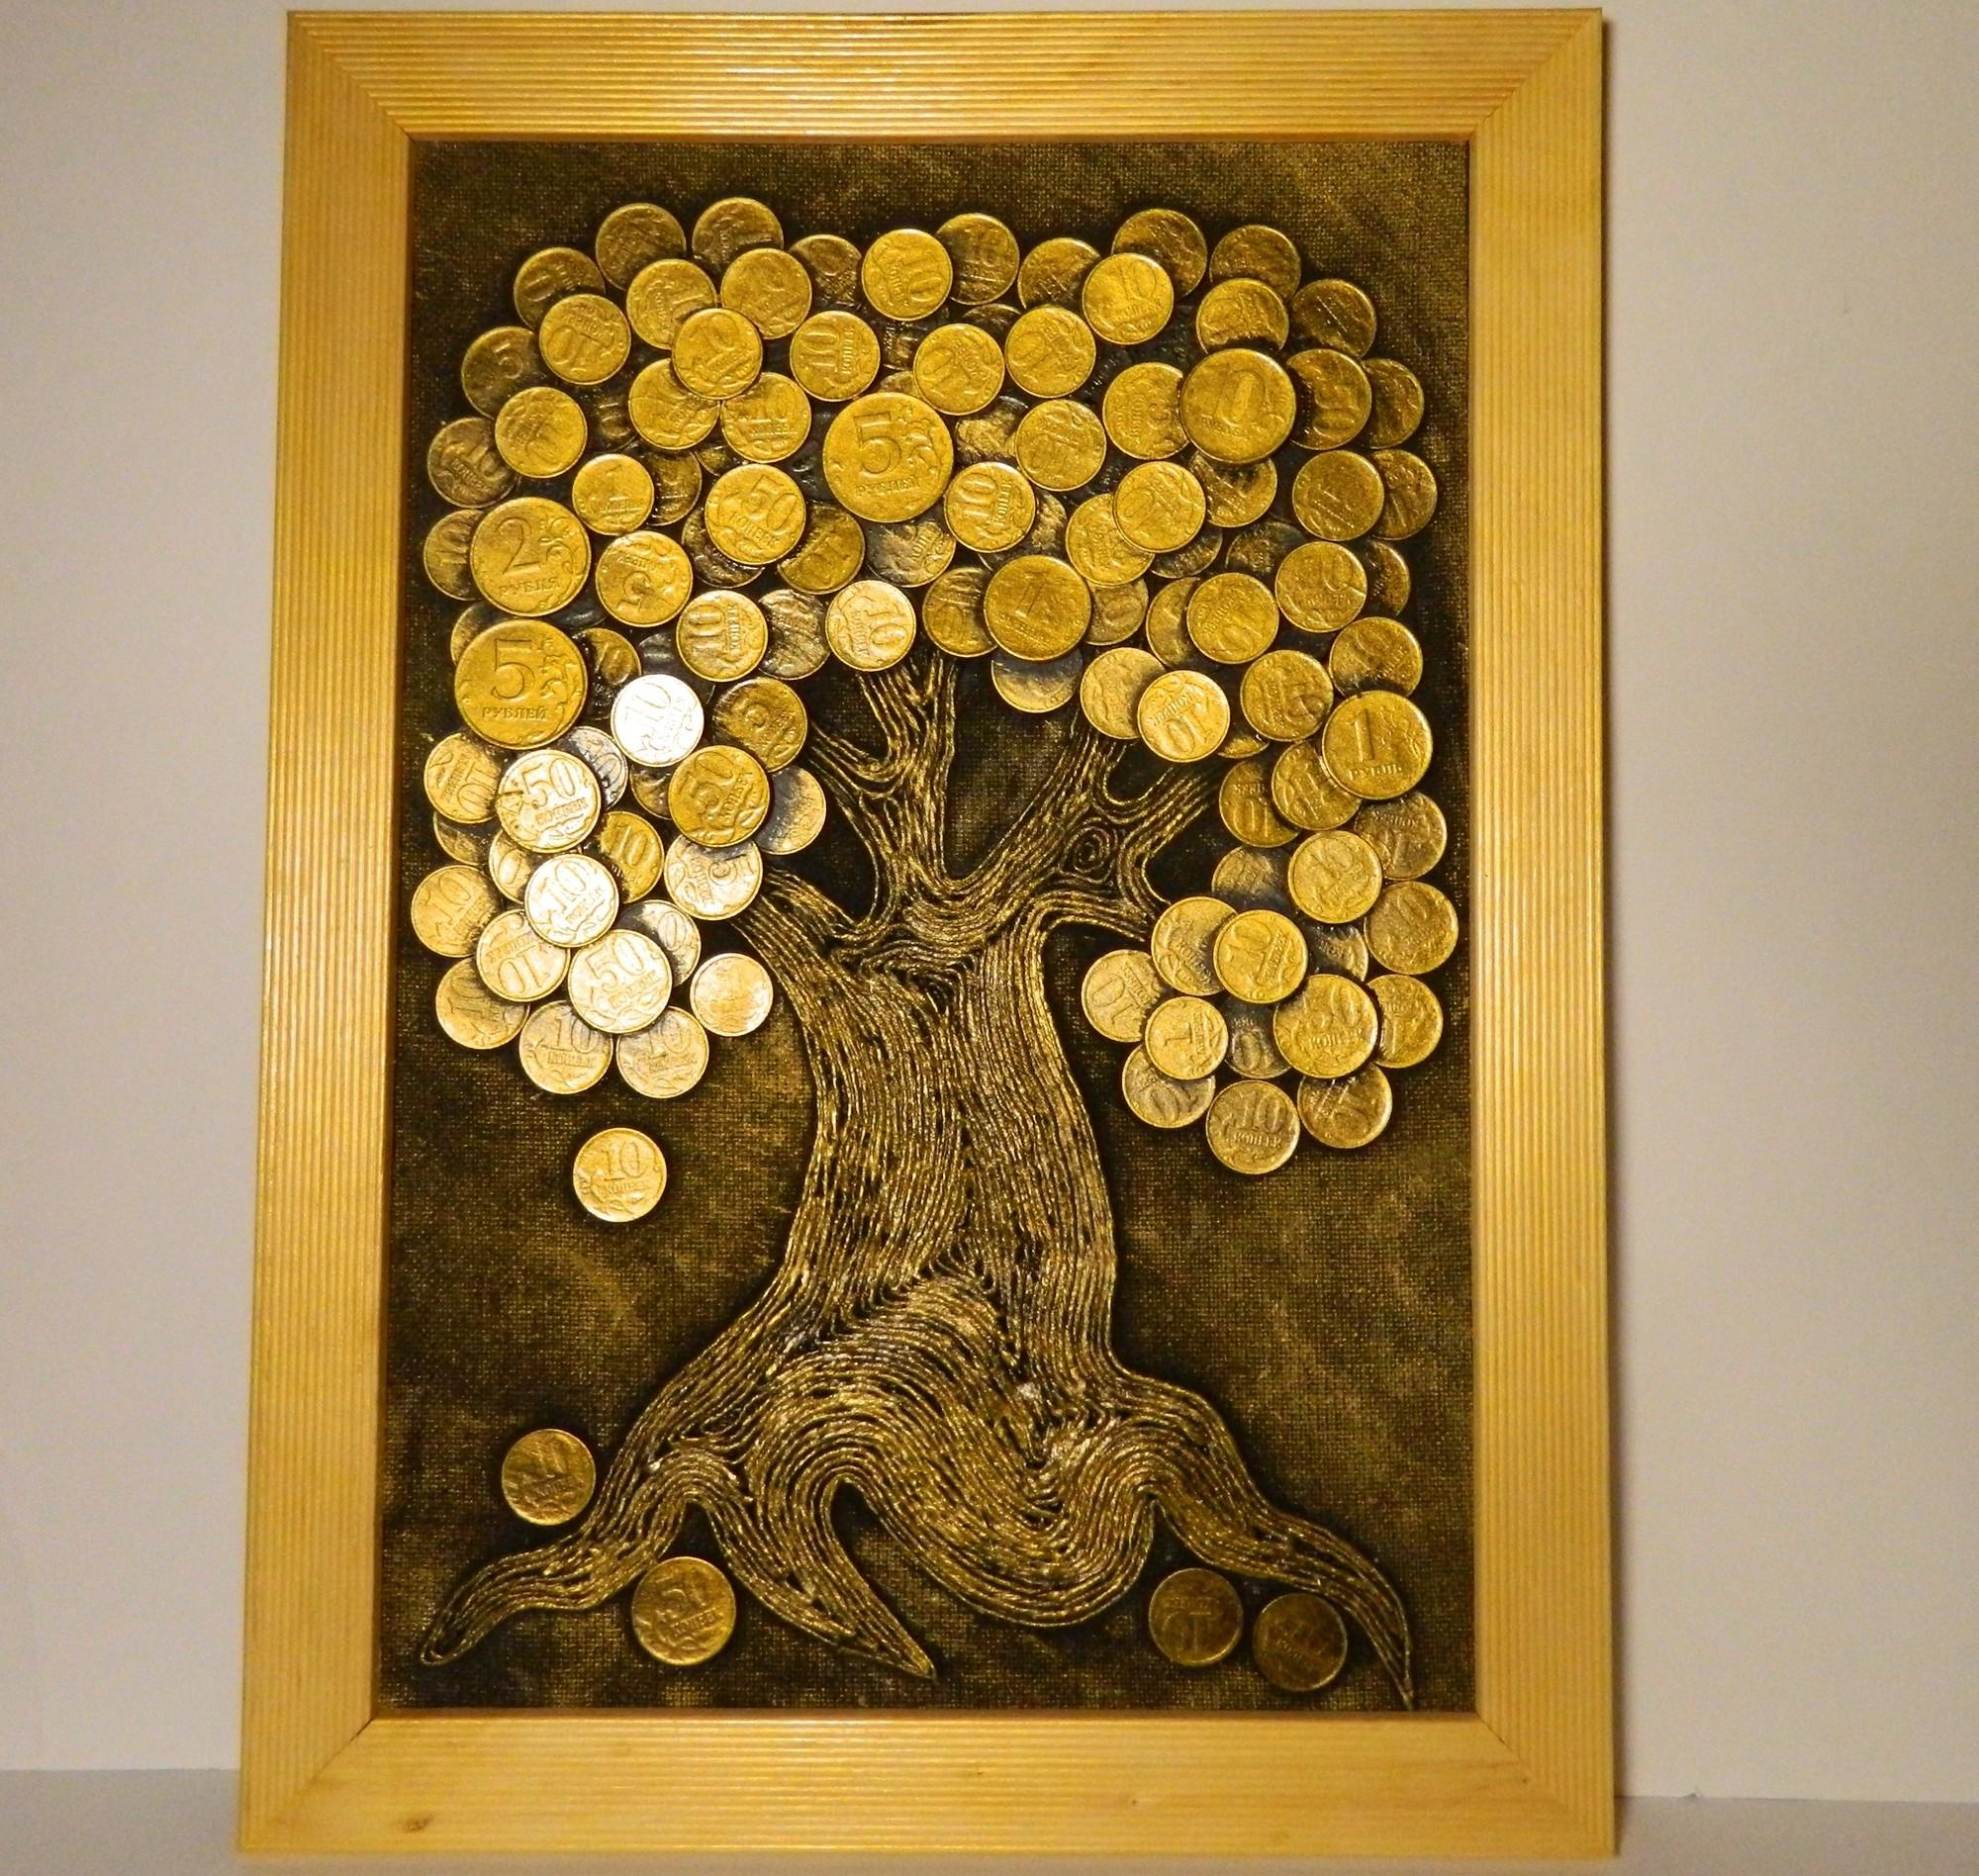 Объемная картина из монет